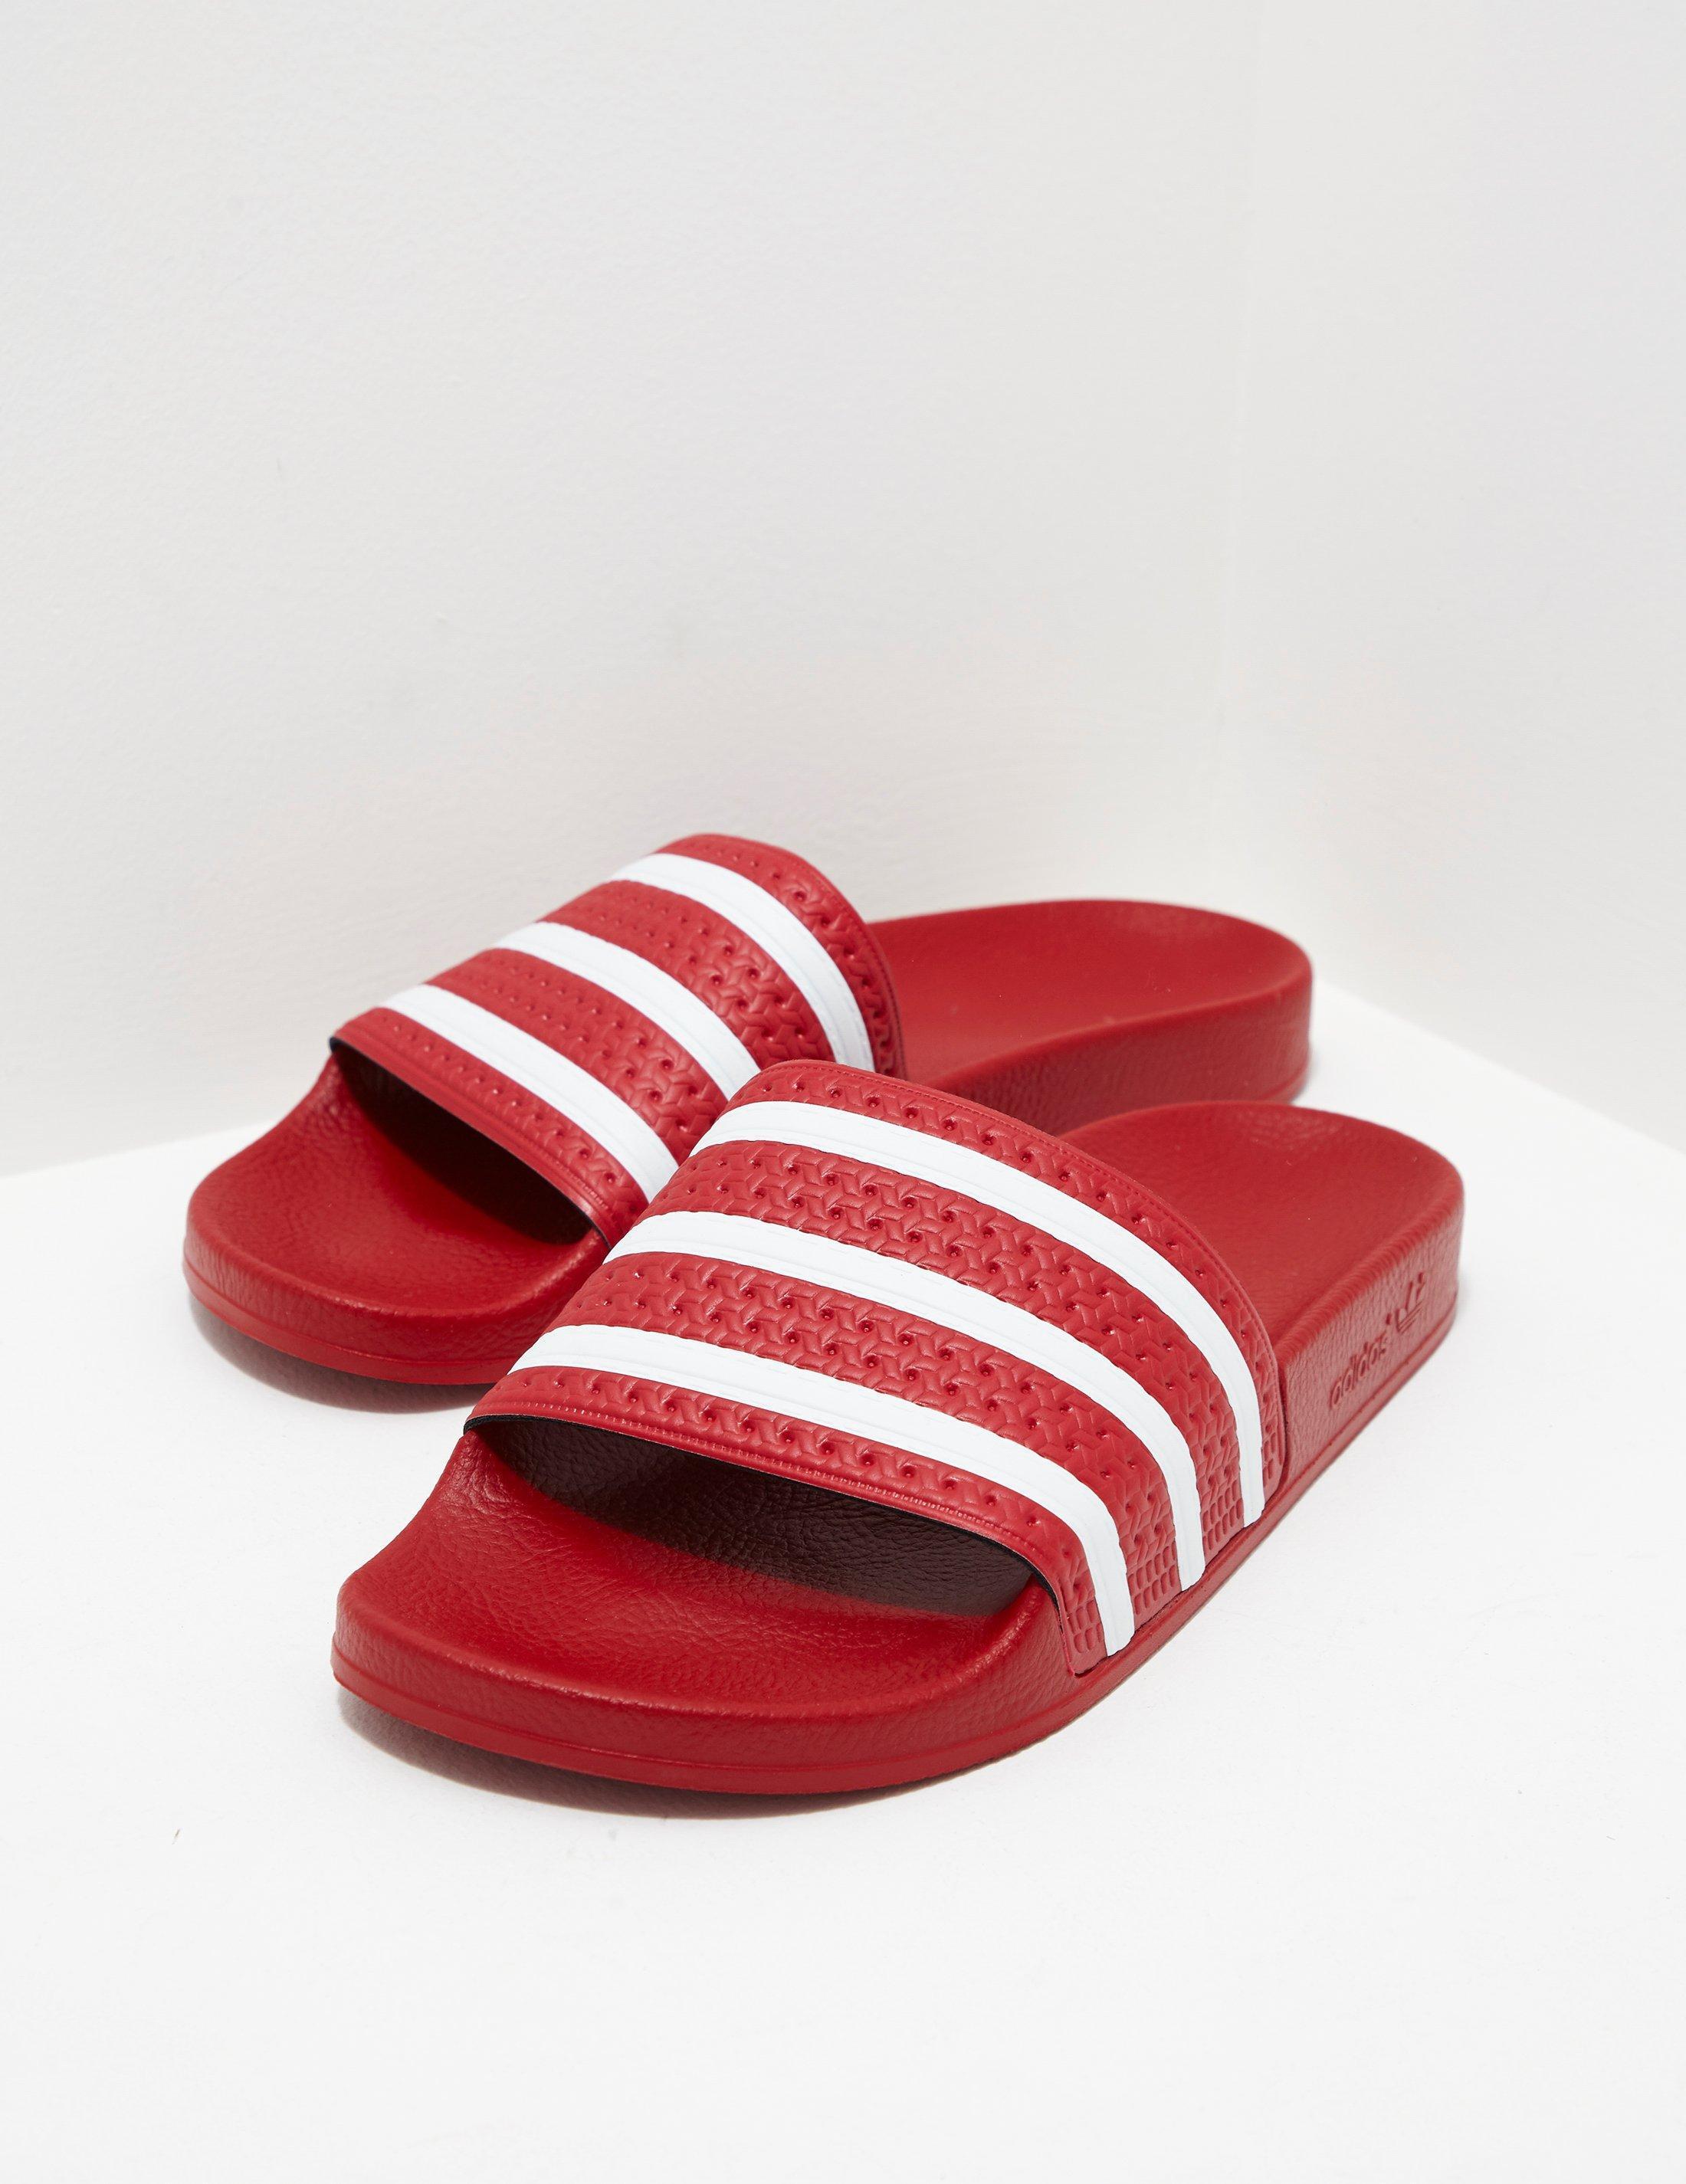 3f7bca0819d00 Lyst - adidas Originals Mens Adilette Slides Red in Red for Men